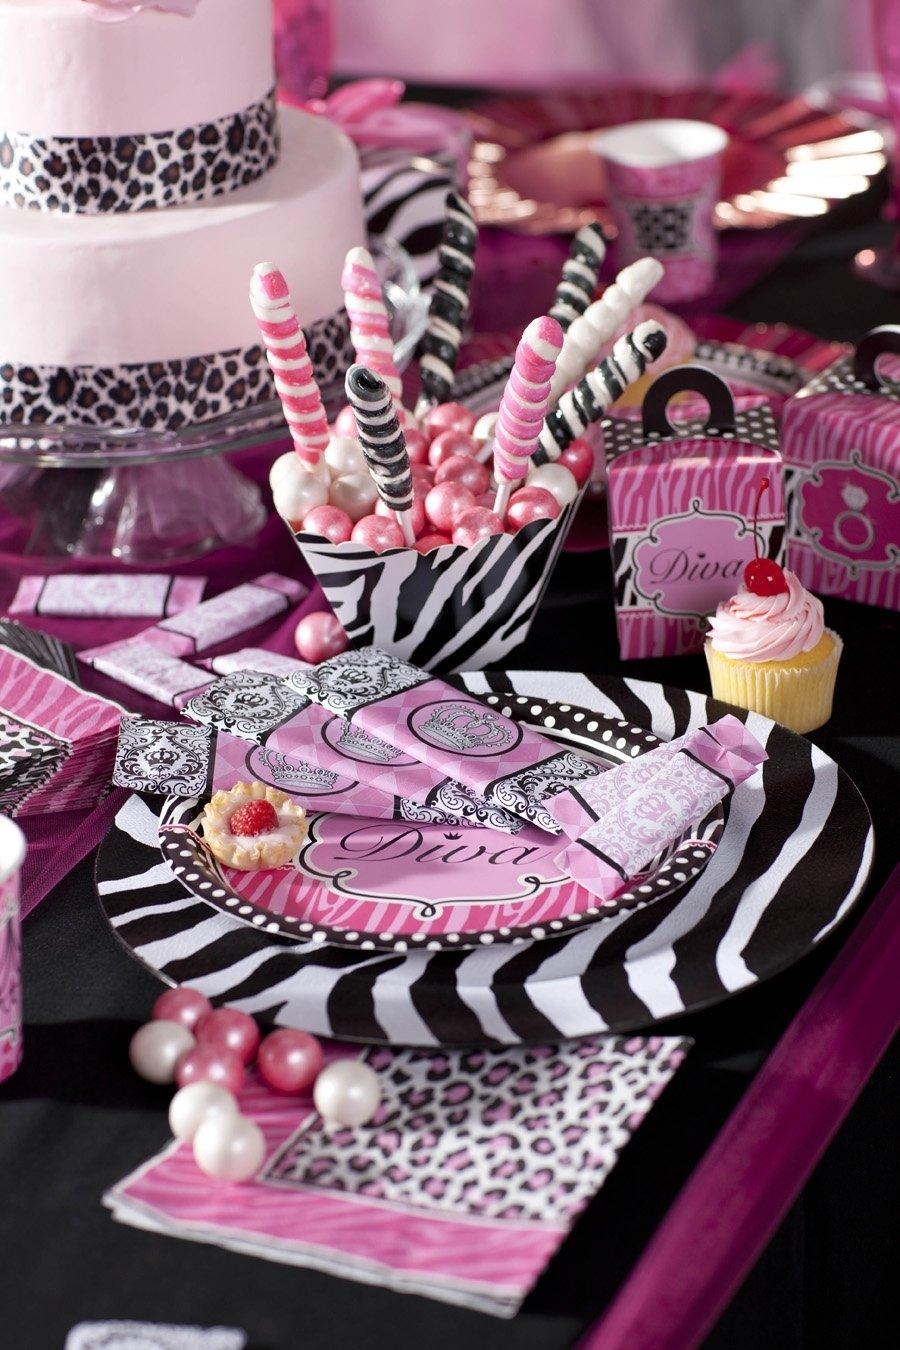 10 Spectacular Zebra Print Party Decoration Ideas cute diva zebra print birthday favors party birthdayexpress 1 2021